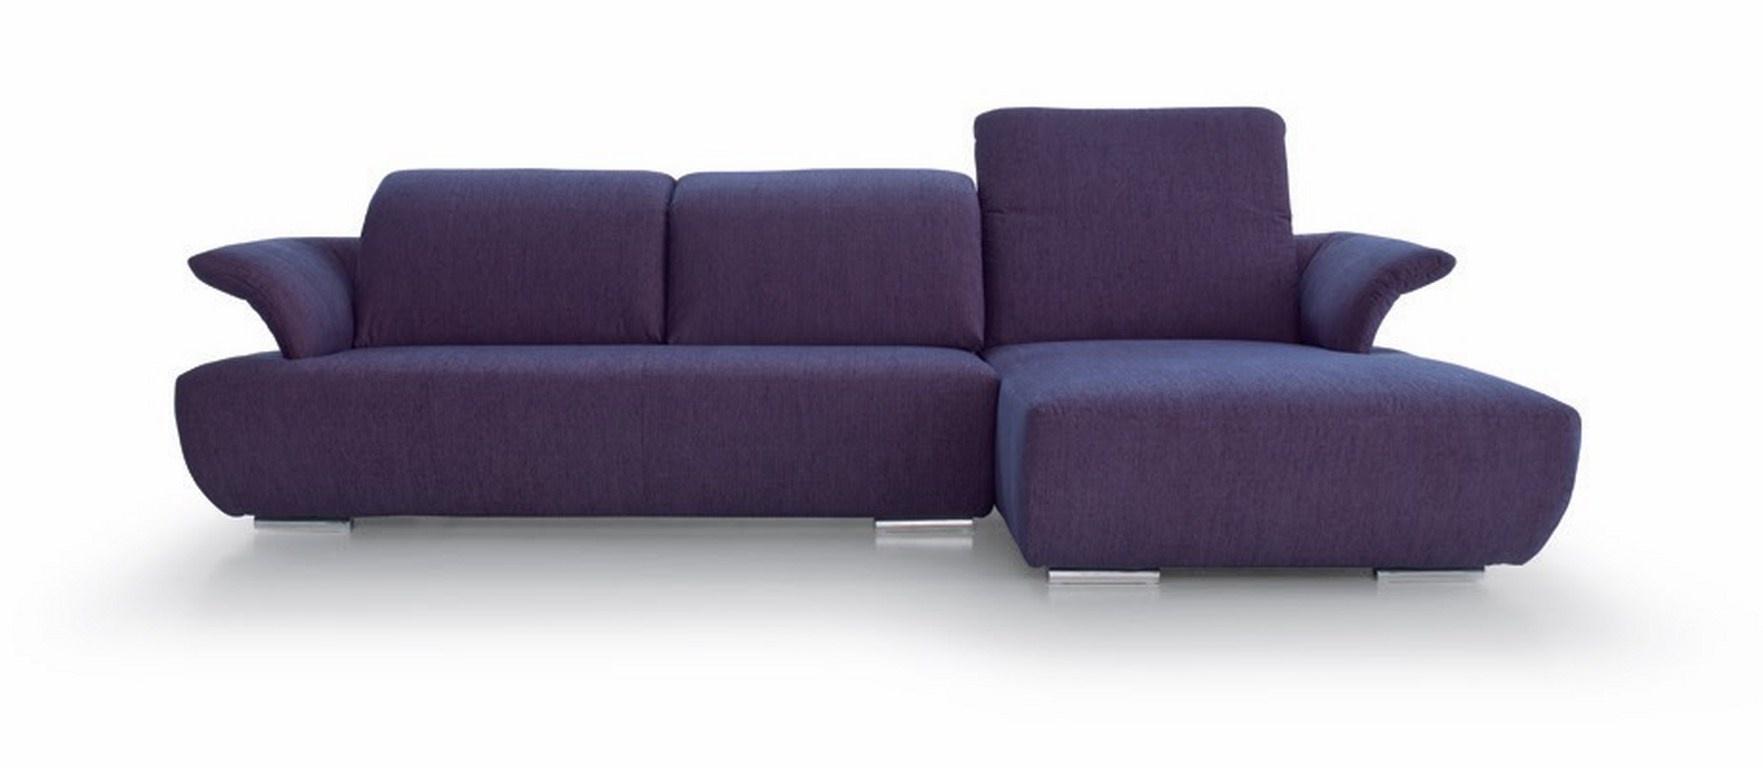 koinor avanti home fort. Black Bedroom Furniture Sets. Home Design Ideas